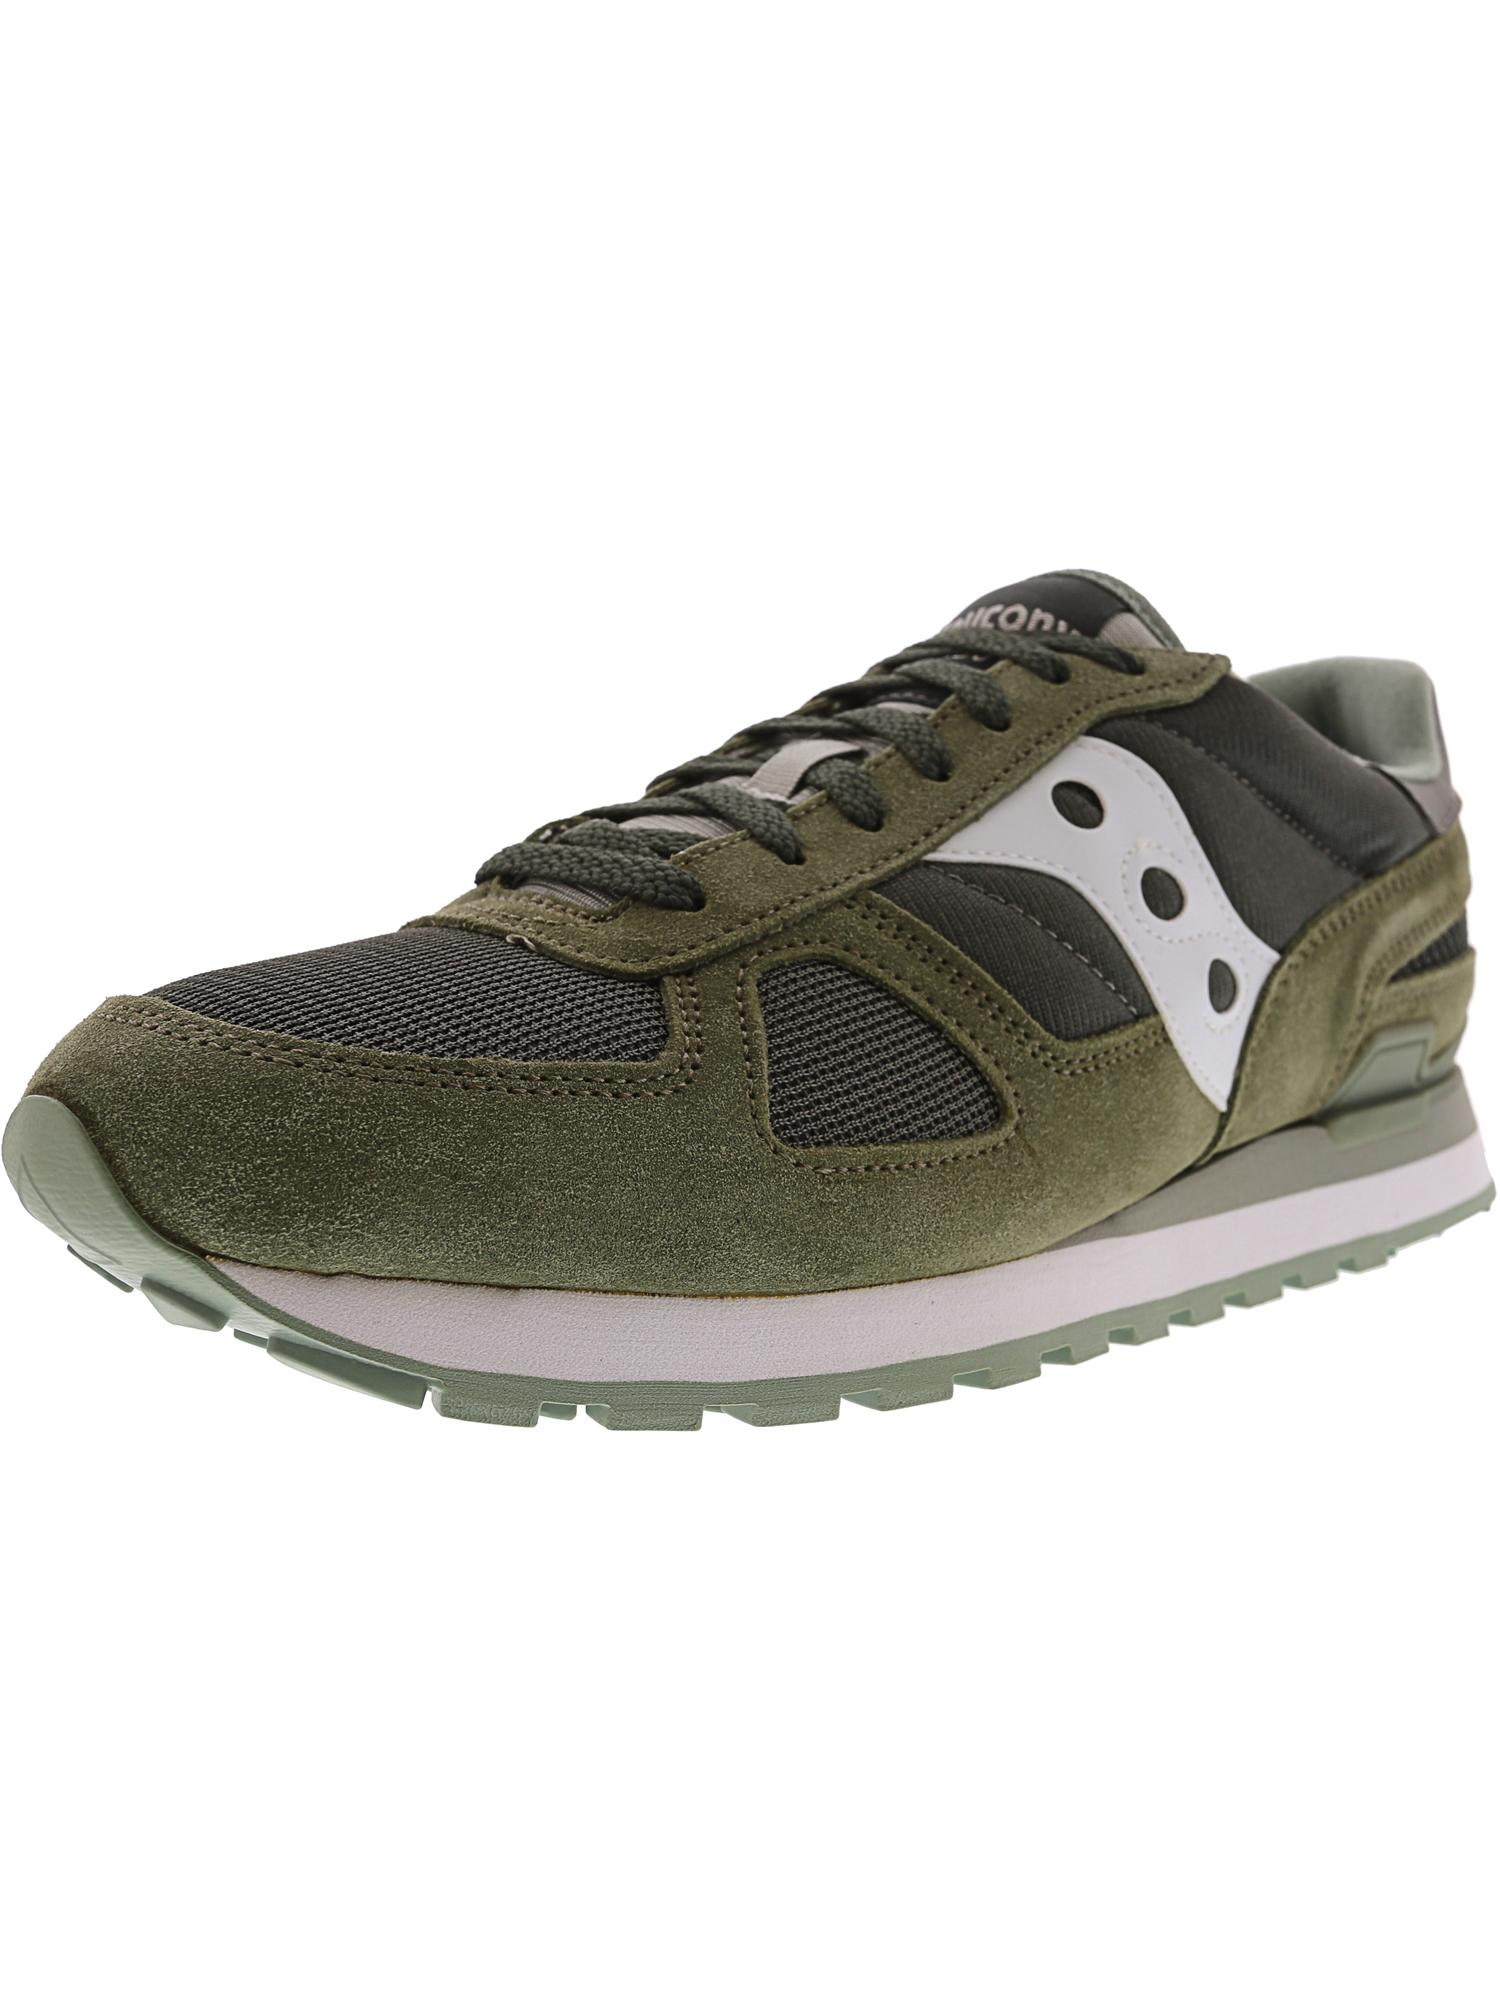 Saucony Men's Shadow Original Tan Ankle-High Canvas Fashion Sneaker - 11M